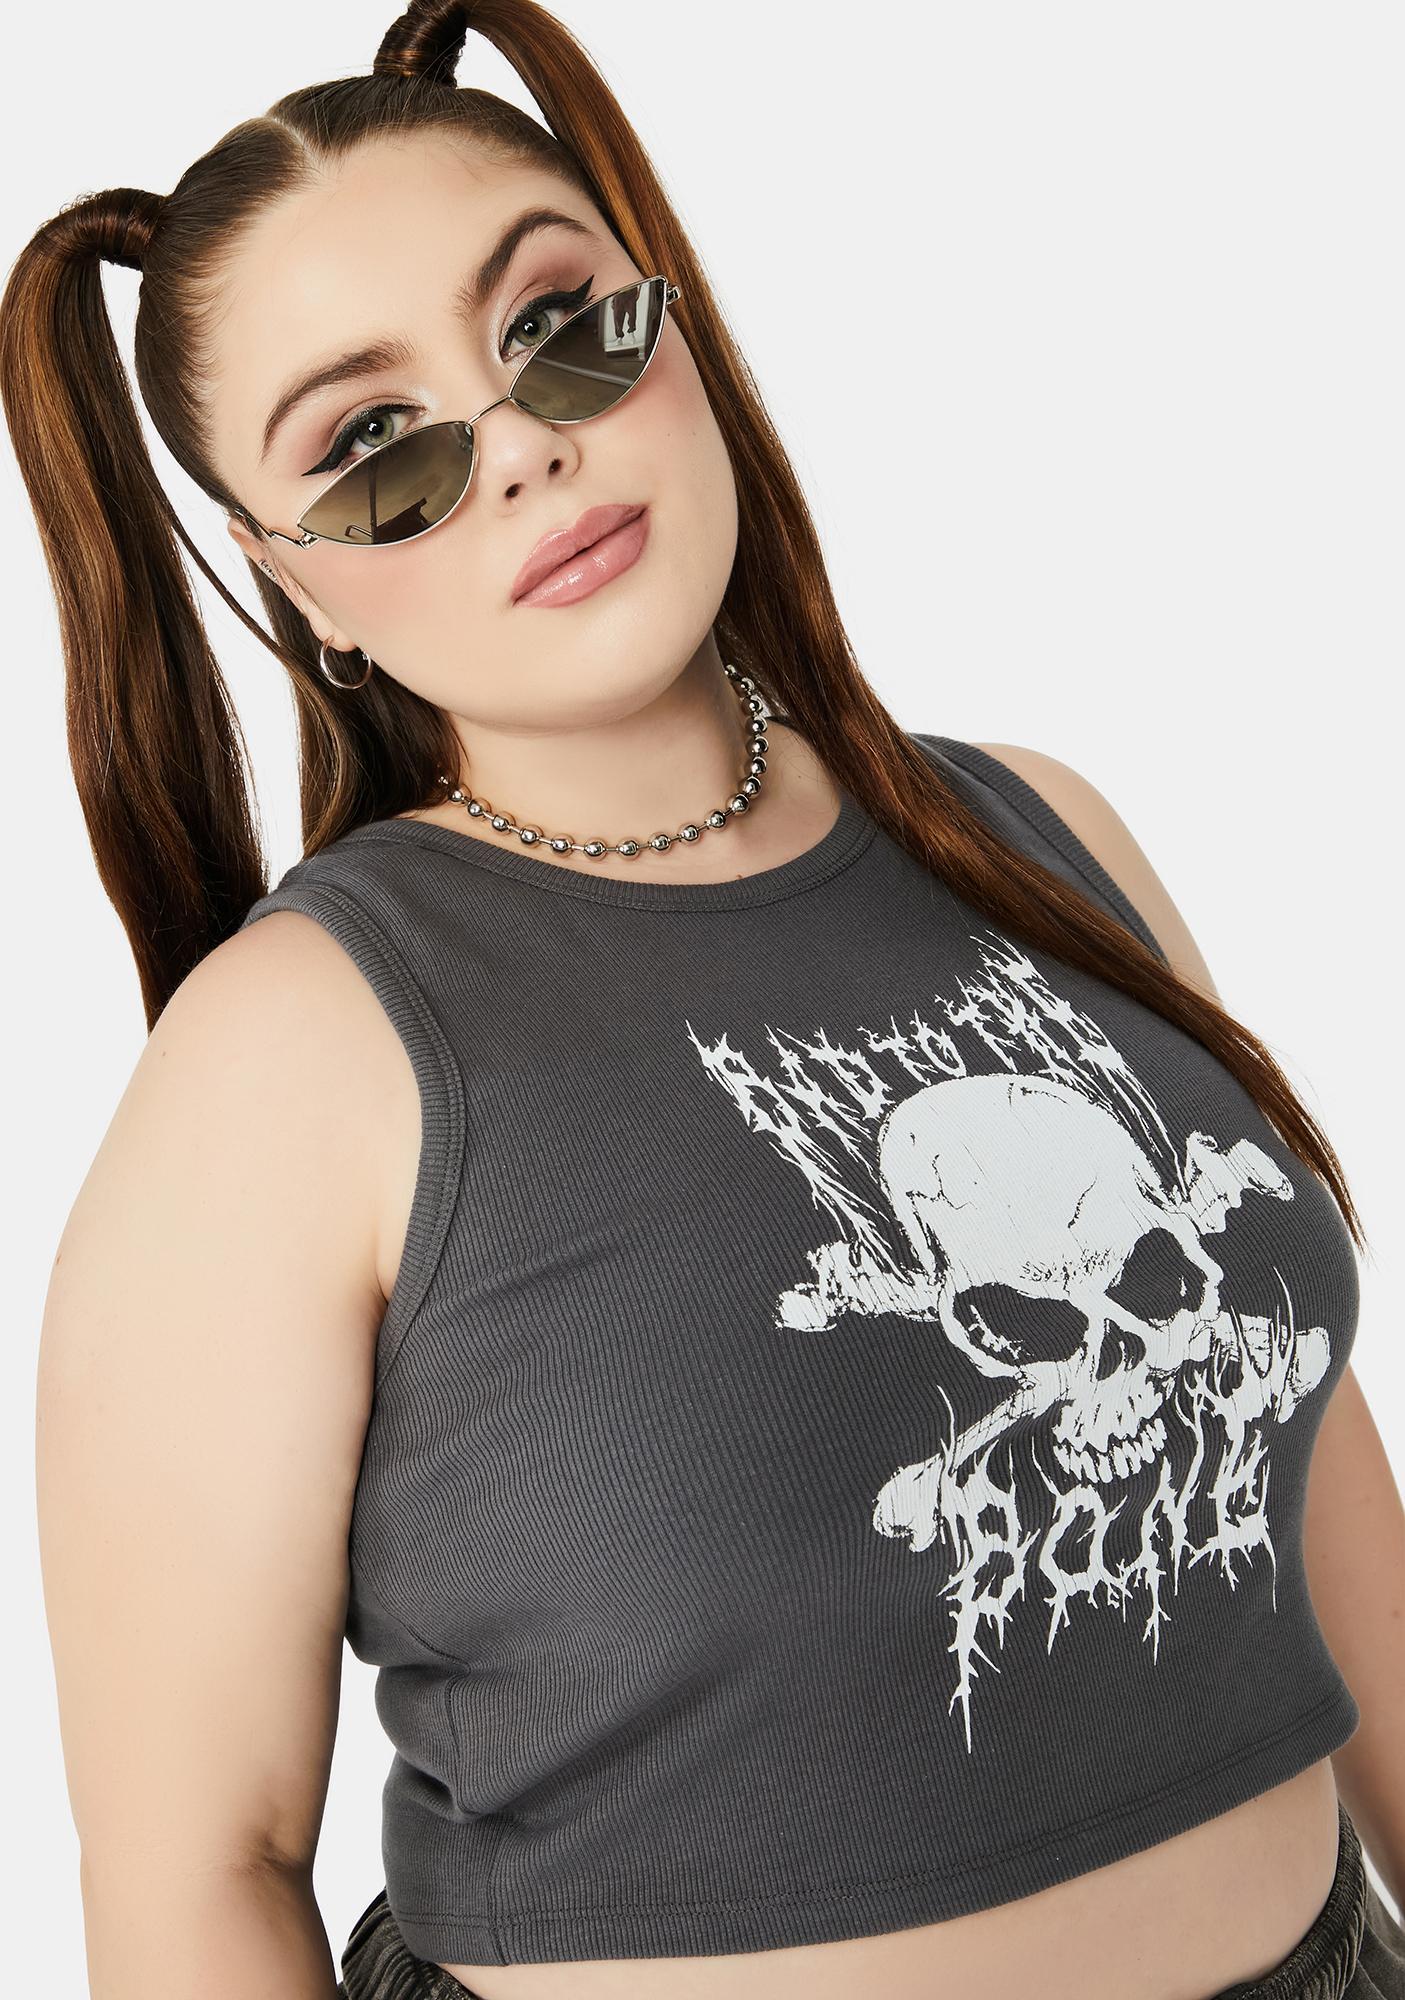 NEW GIRL ORDER Curve Skull Sports Tank Top